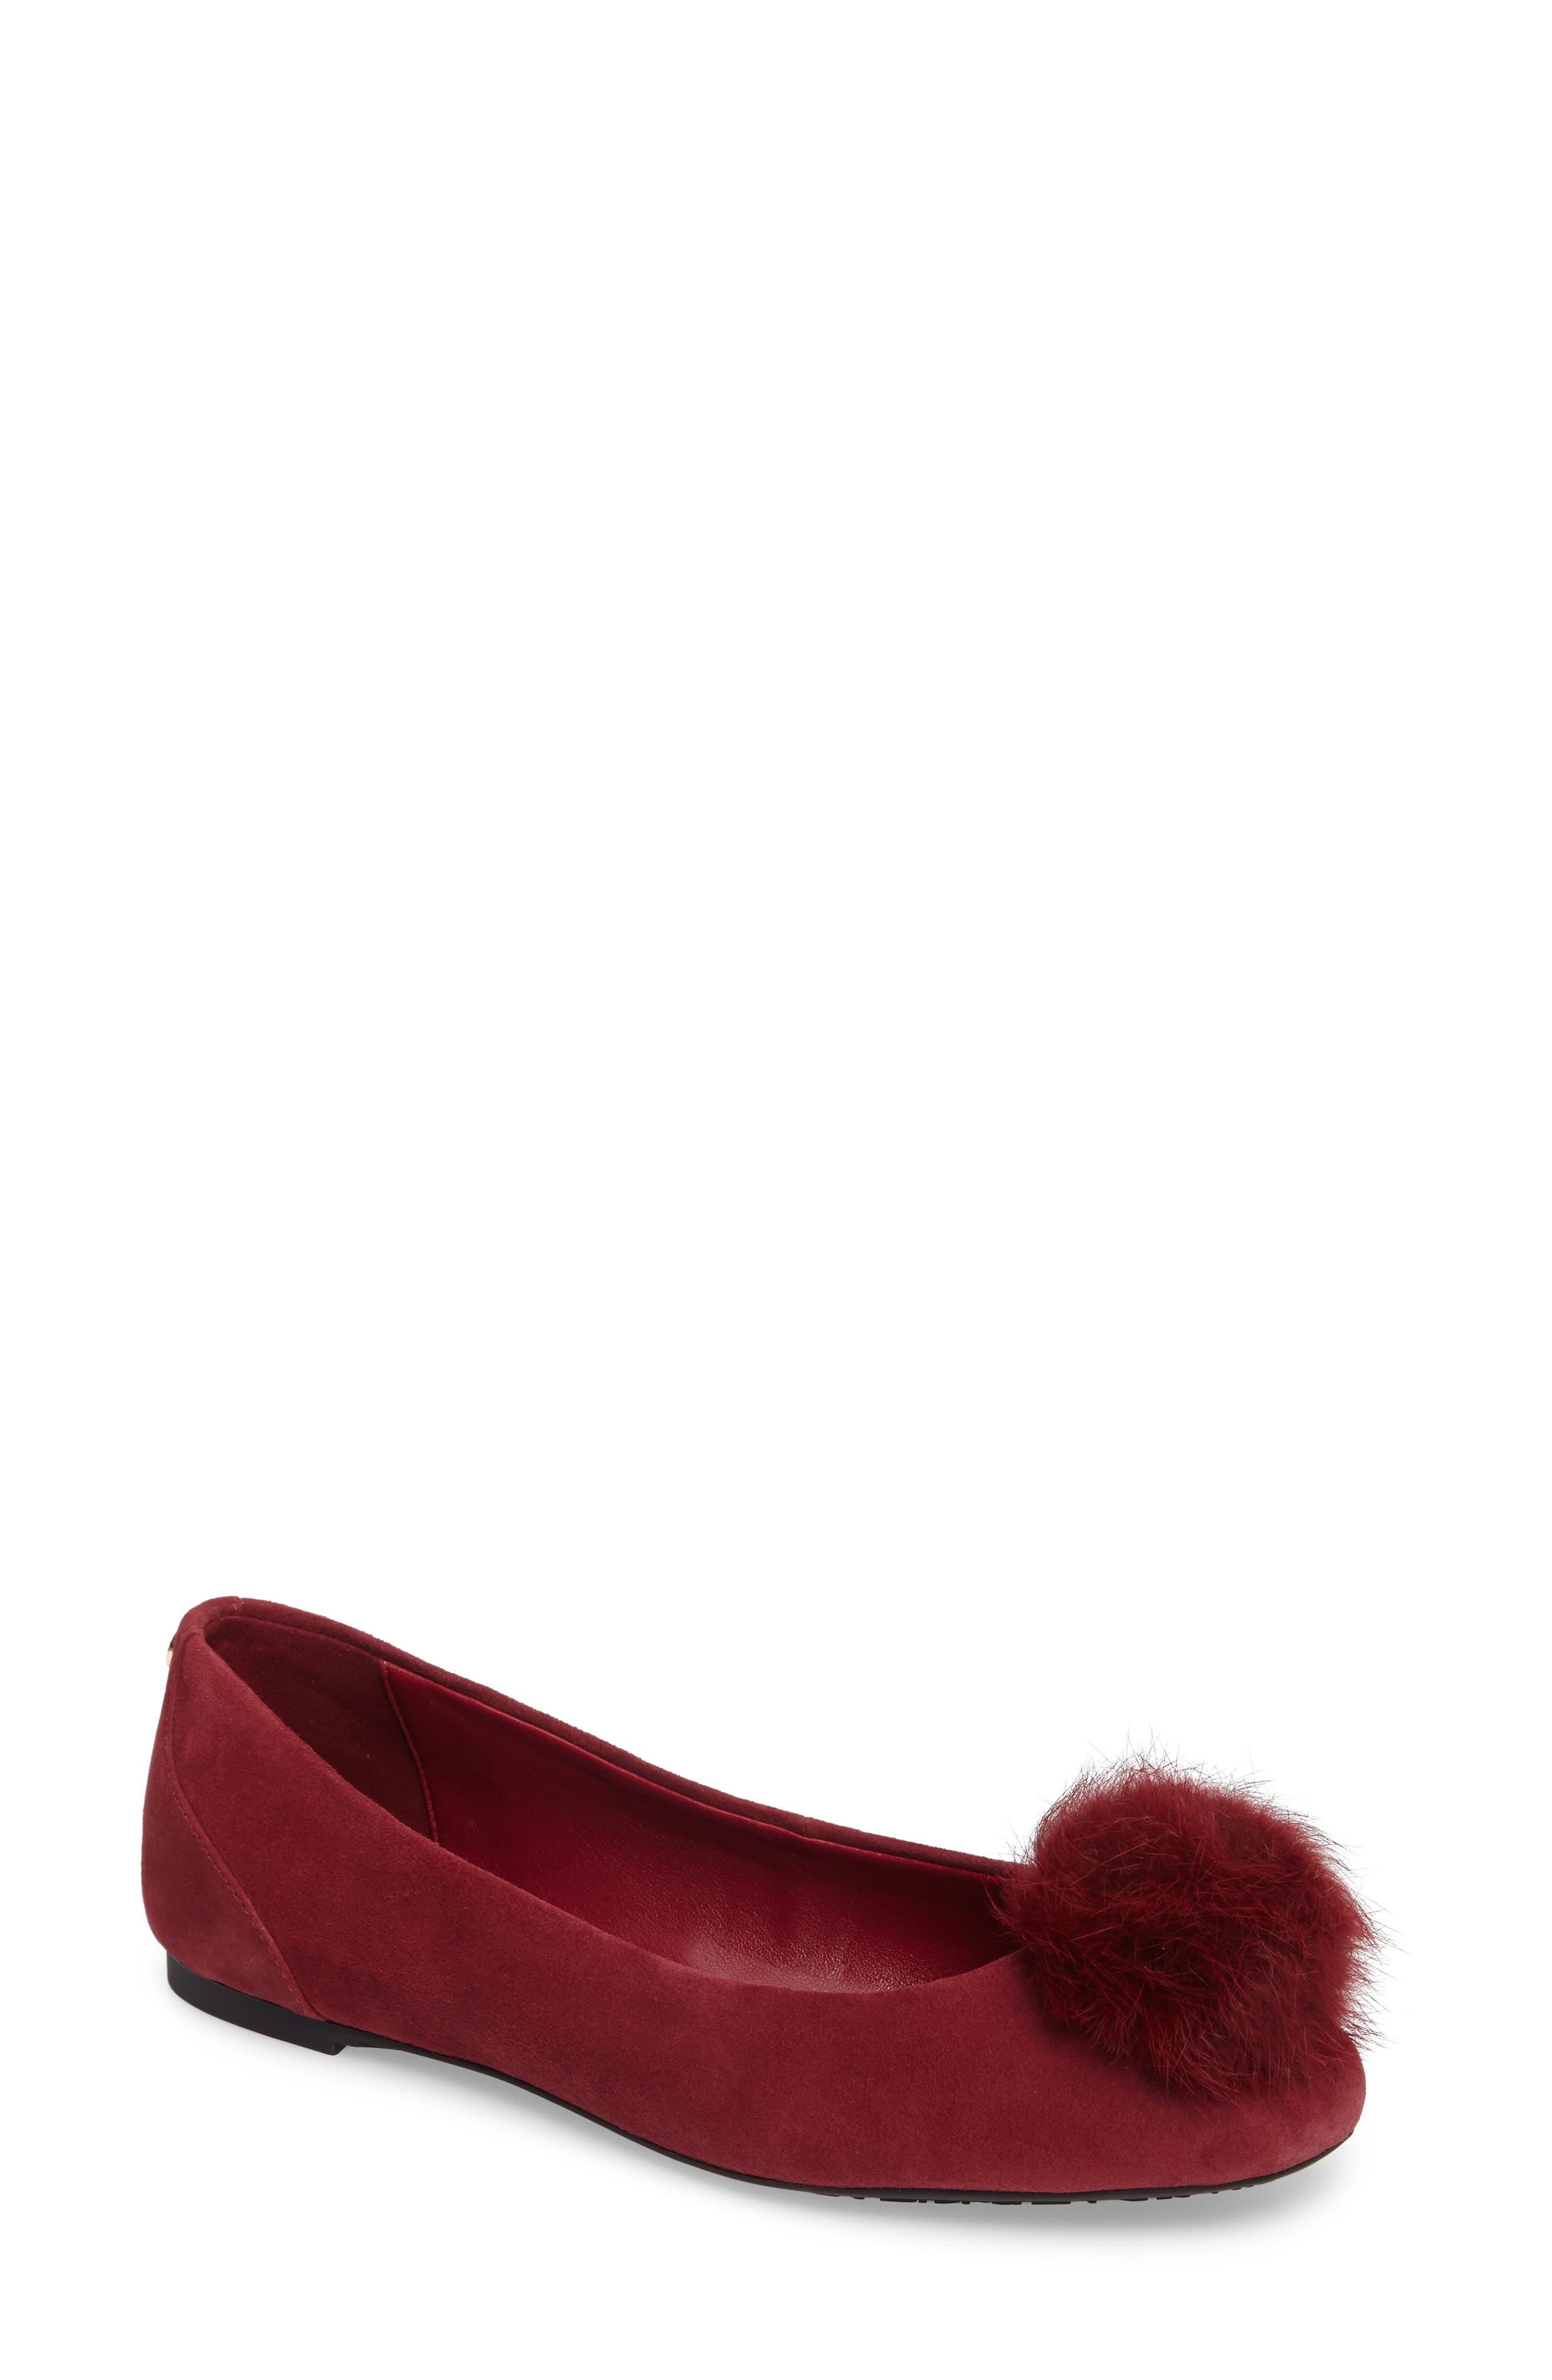 MICHAEL Michael Kors Remi Ballet Flat with Genuine Rabbit Fur Pom (Women)